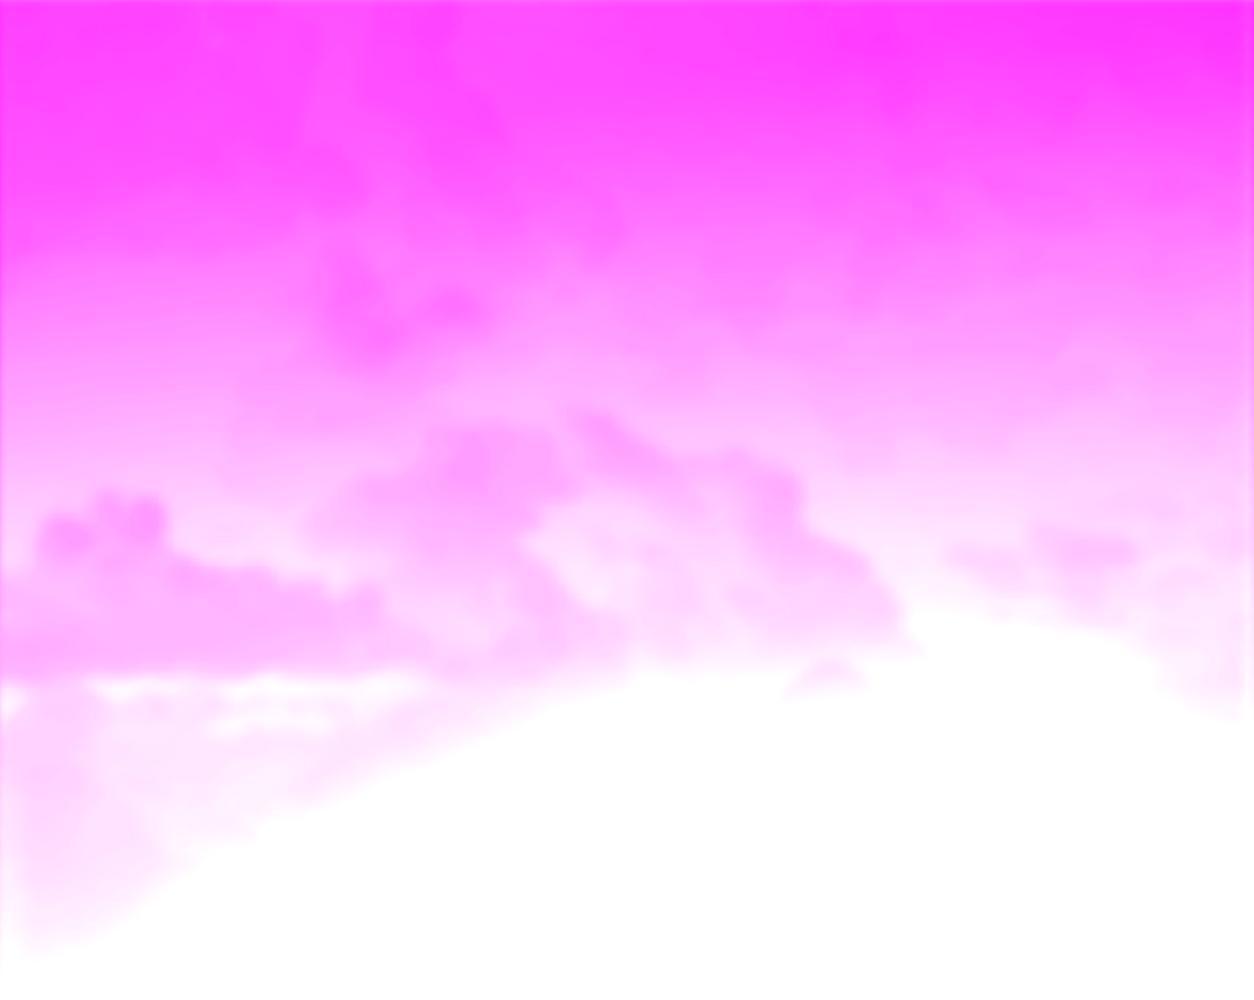 screaming clouds (wallpaper)